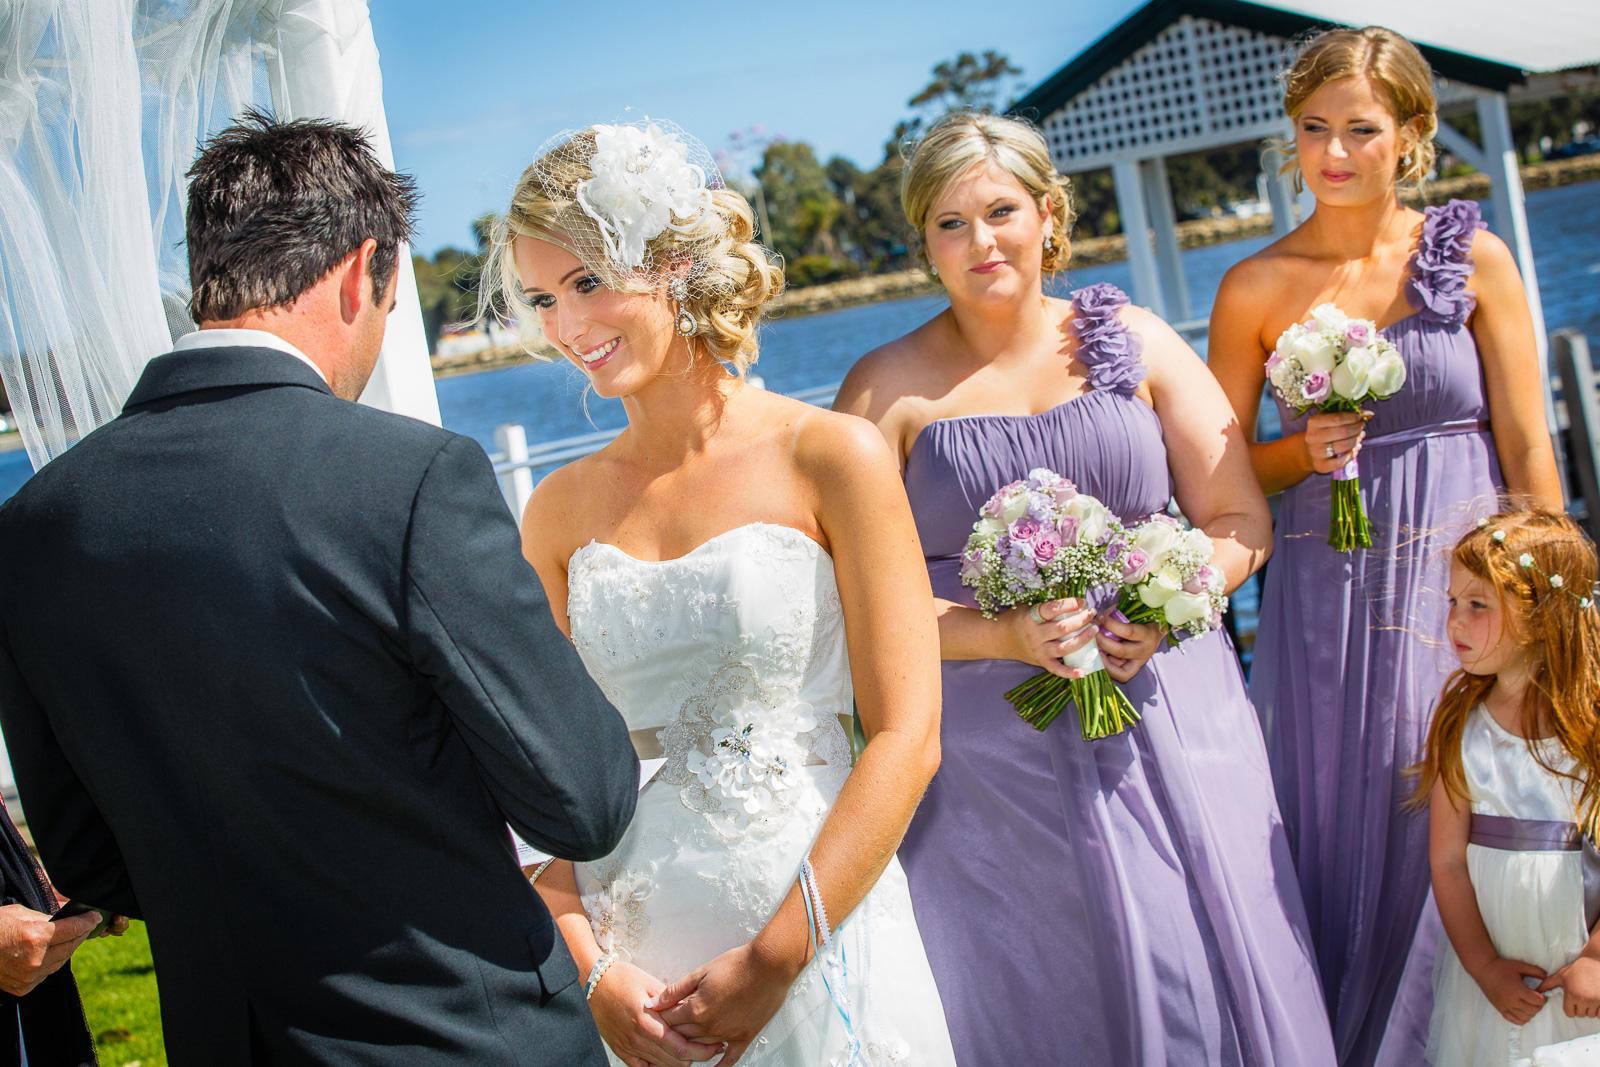 Aimee_Brett_Modern-Vintage-Wedding_026